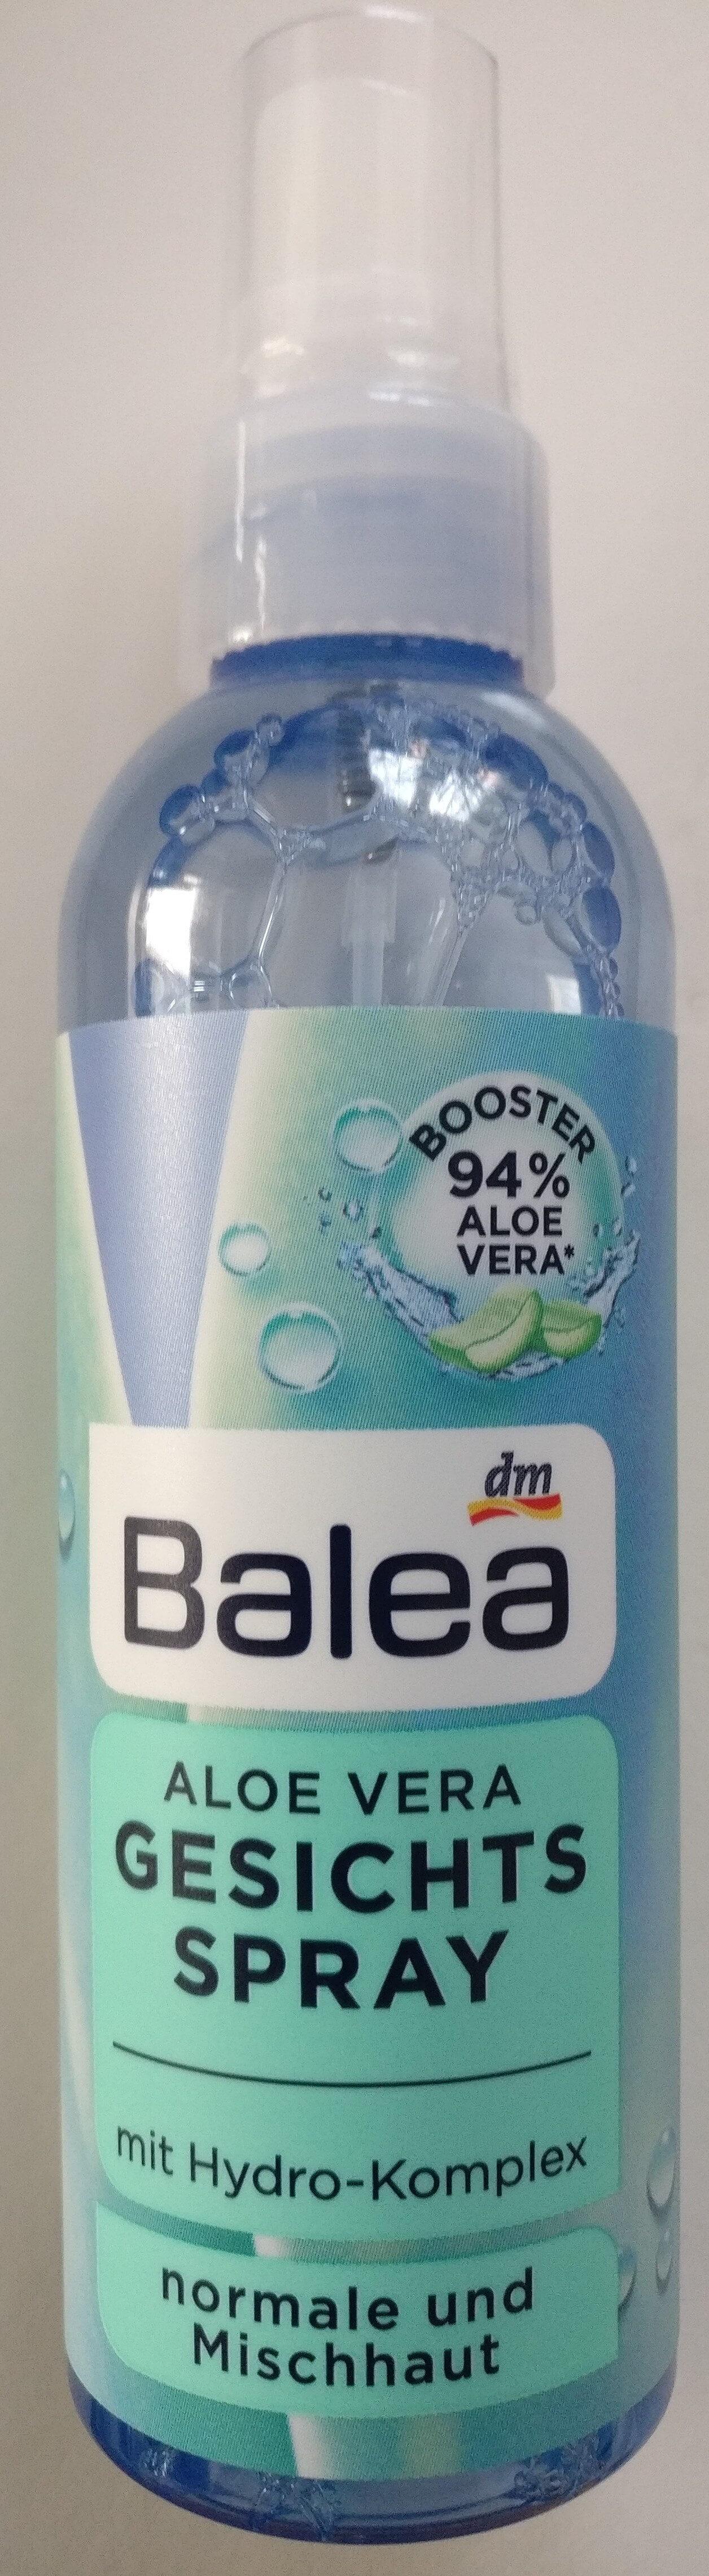 Gesichtsspray Aloe Vera - Product - en